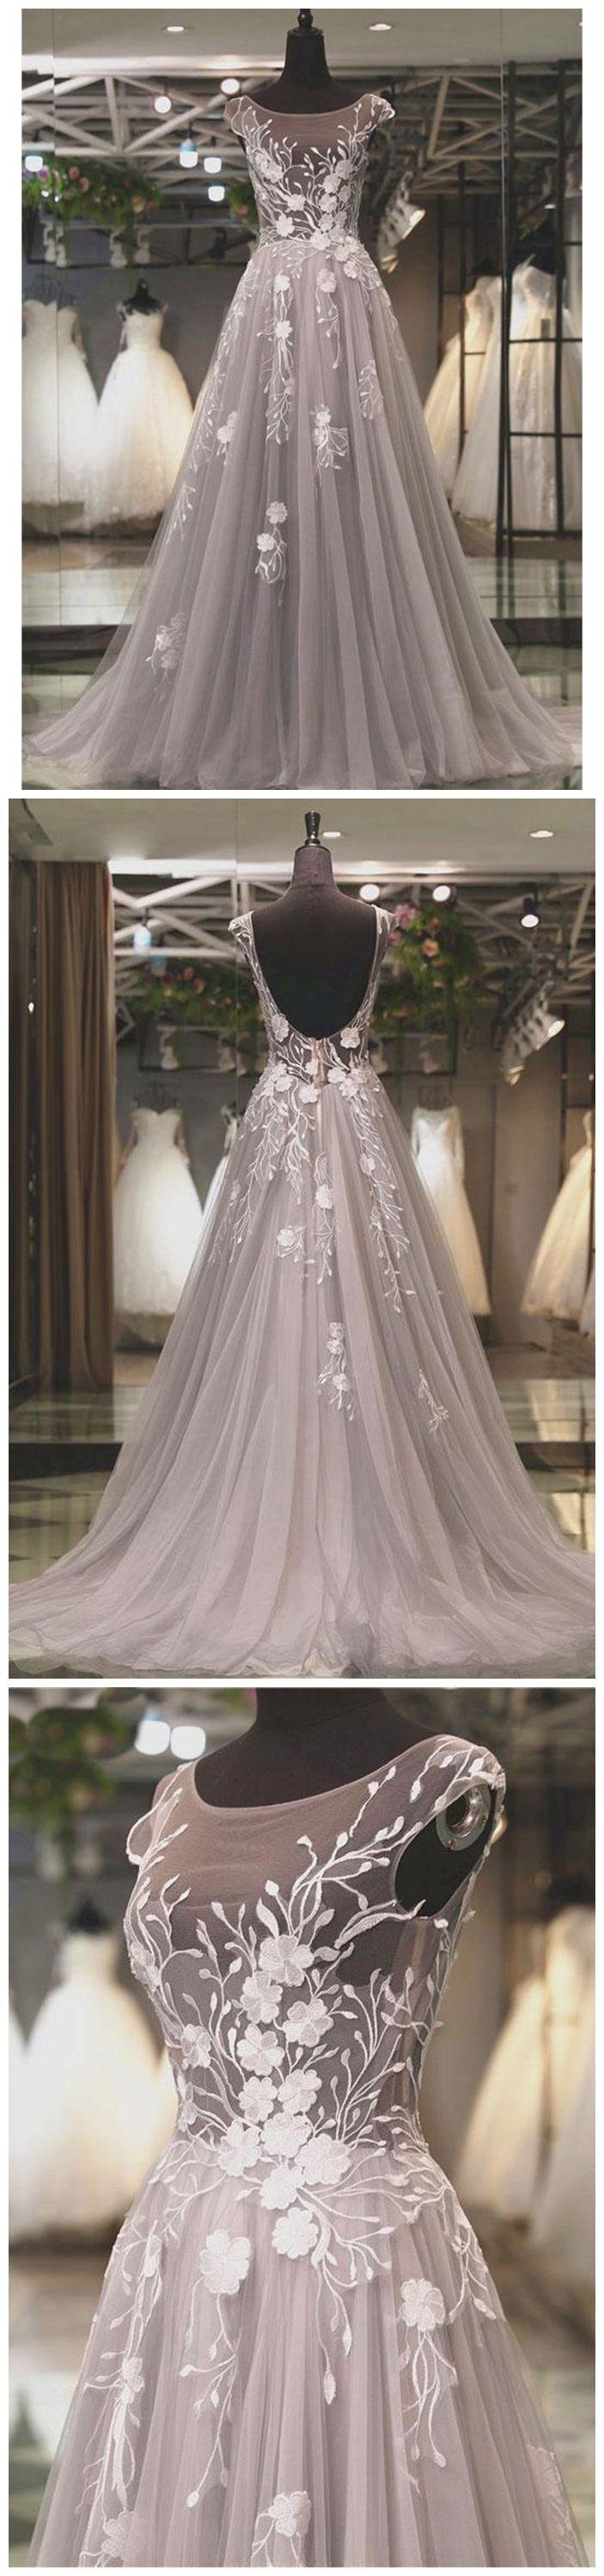 Beautiful prom dresses backless prom dresses prom dresses